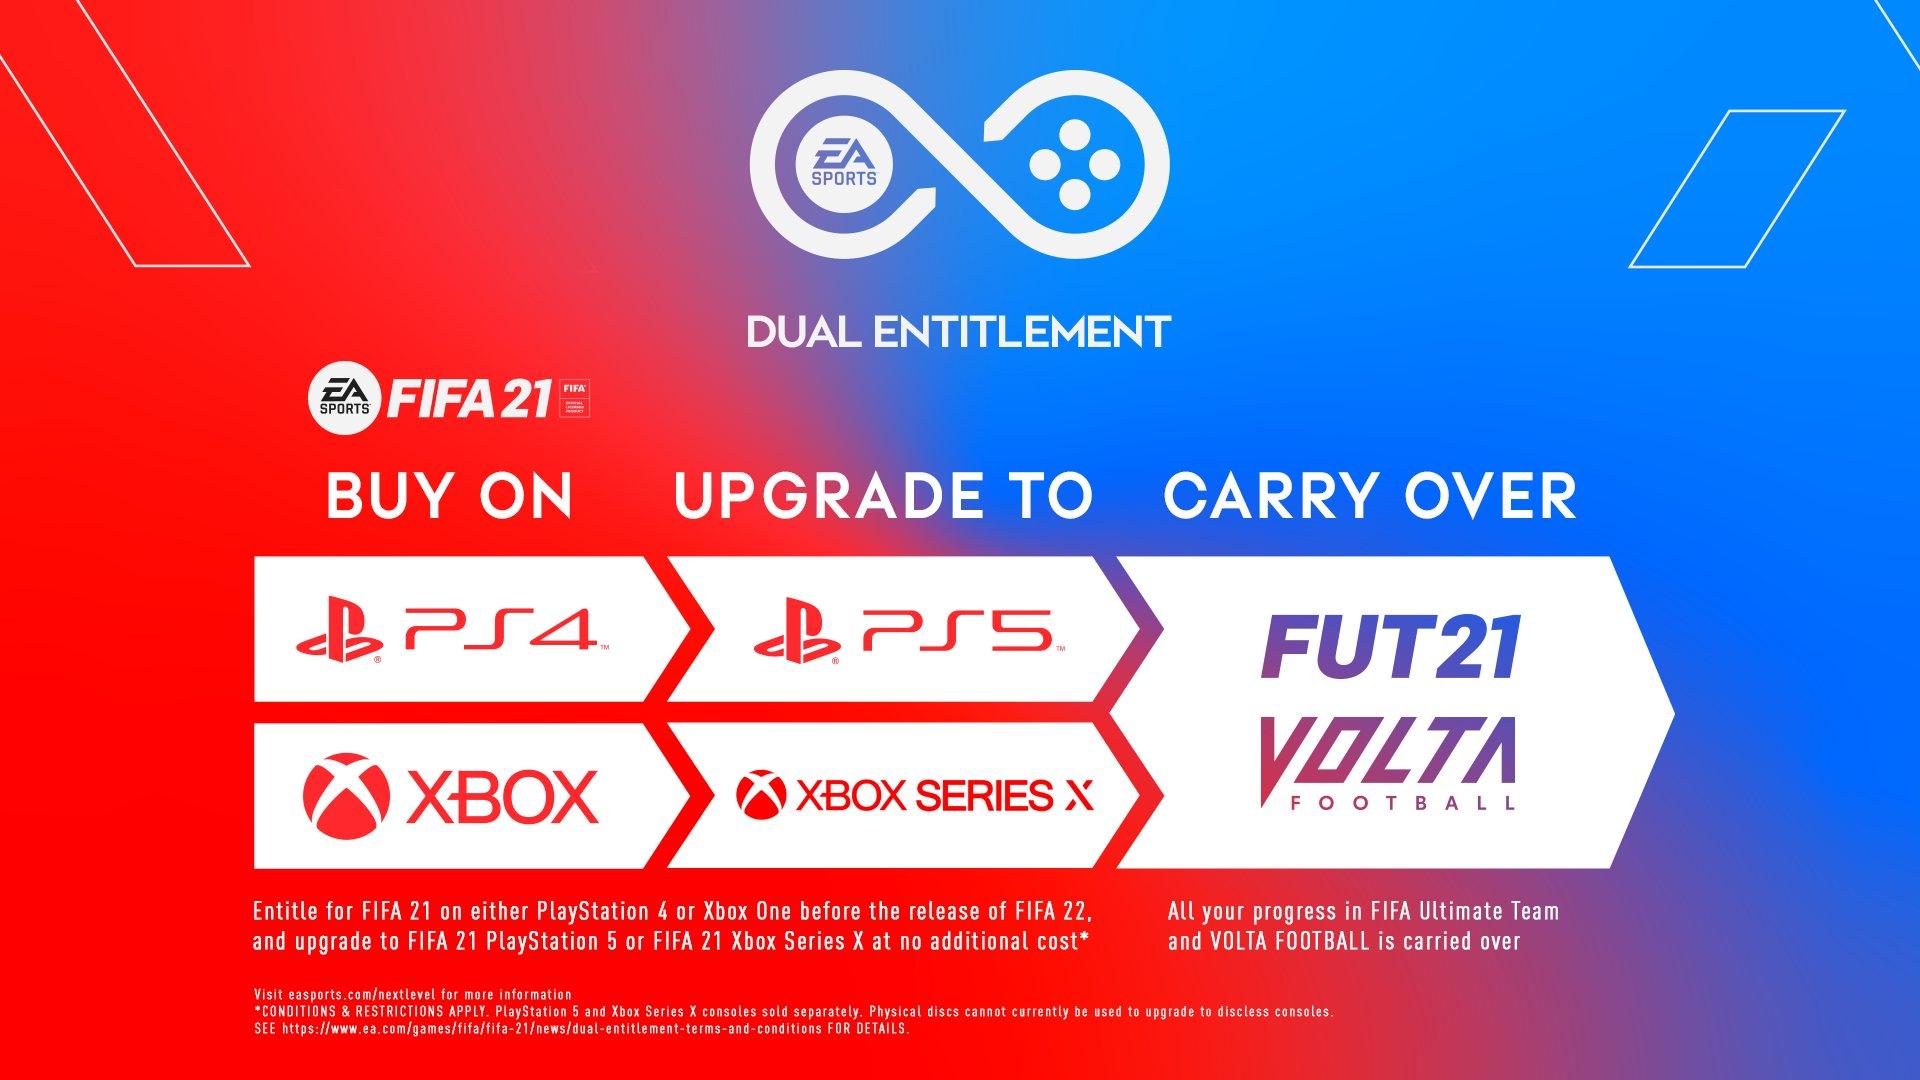 EA SPORTS FIFA 21 dual entitlement PS5 Xbox Series X